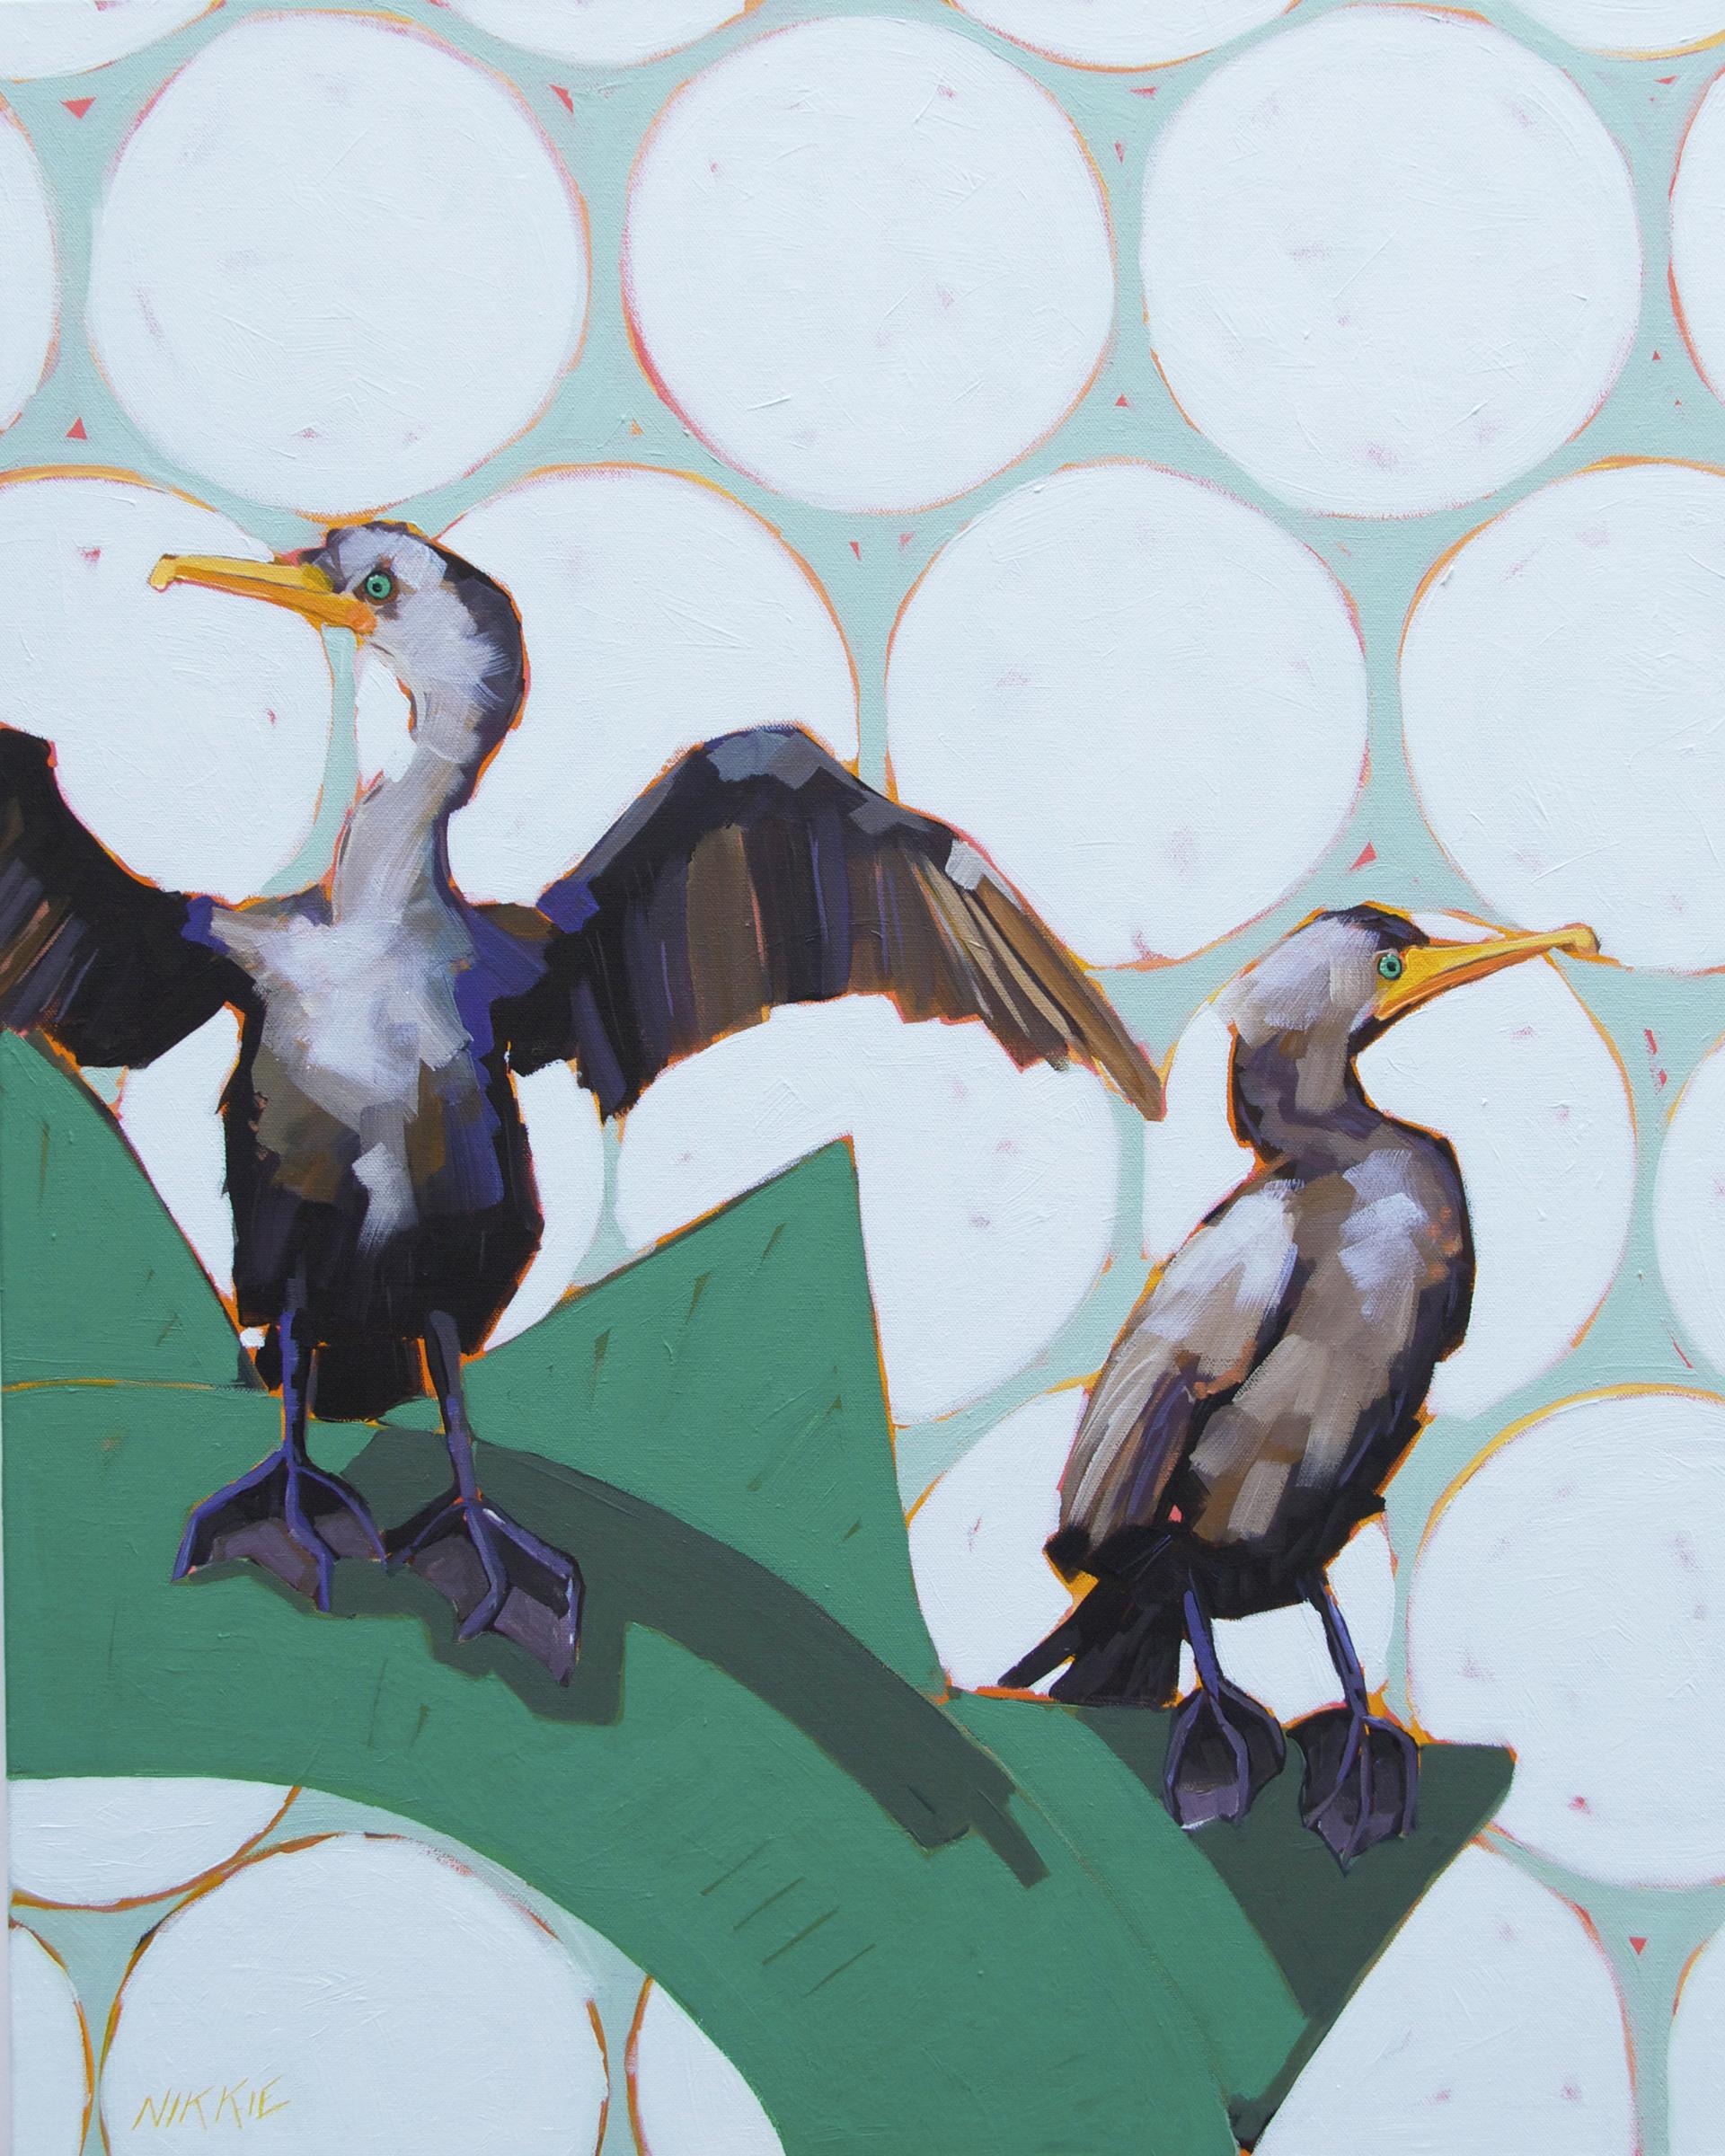 Cormorants by Nikkie Markle